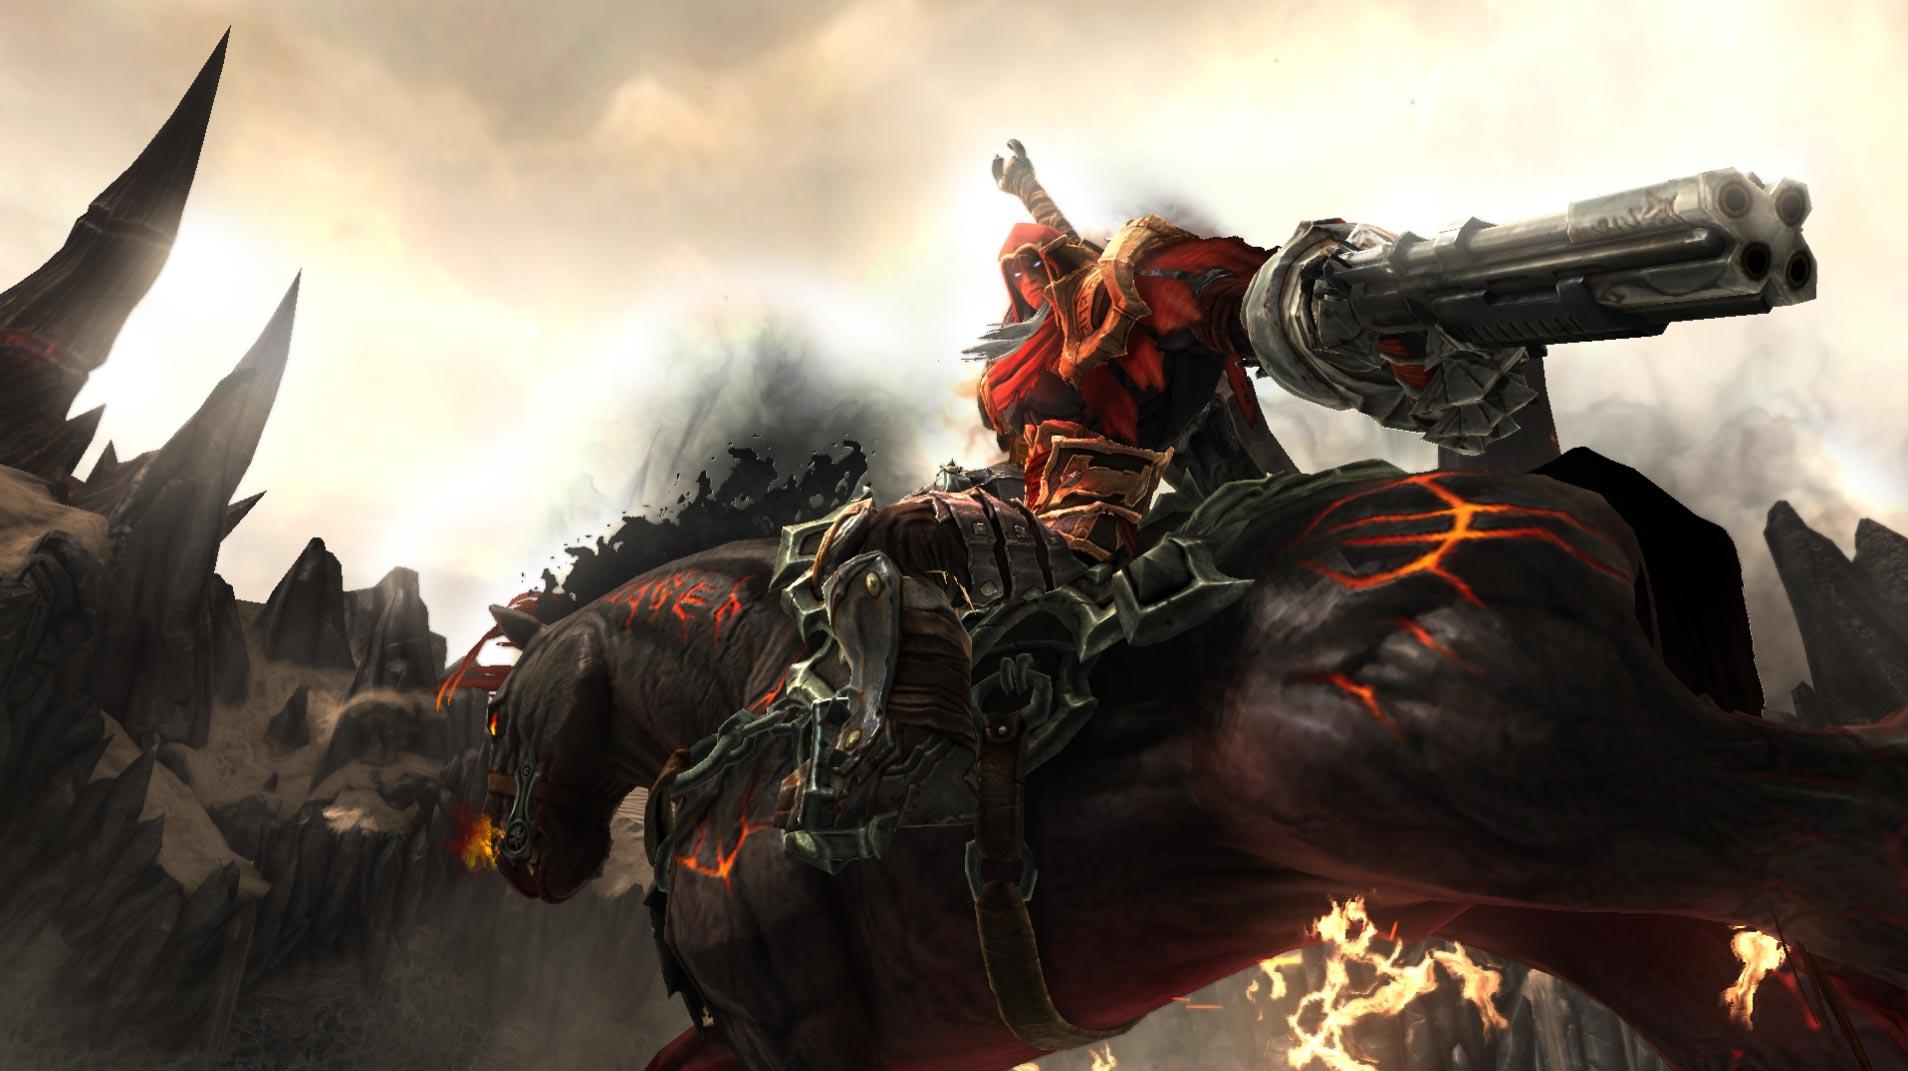 Скриншоты к игре Darksiders.